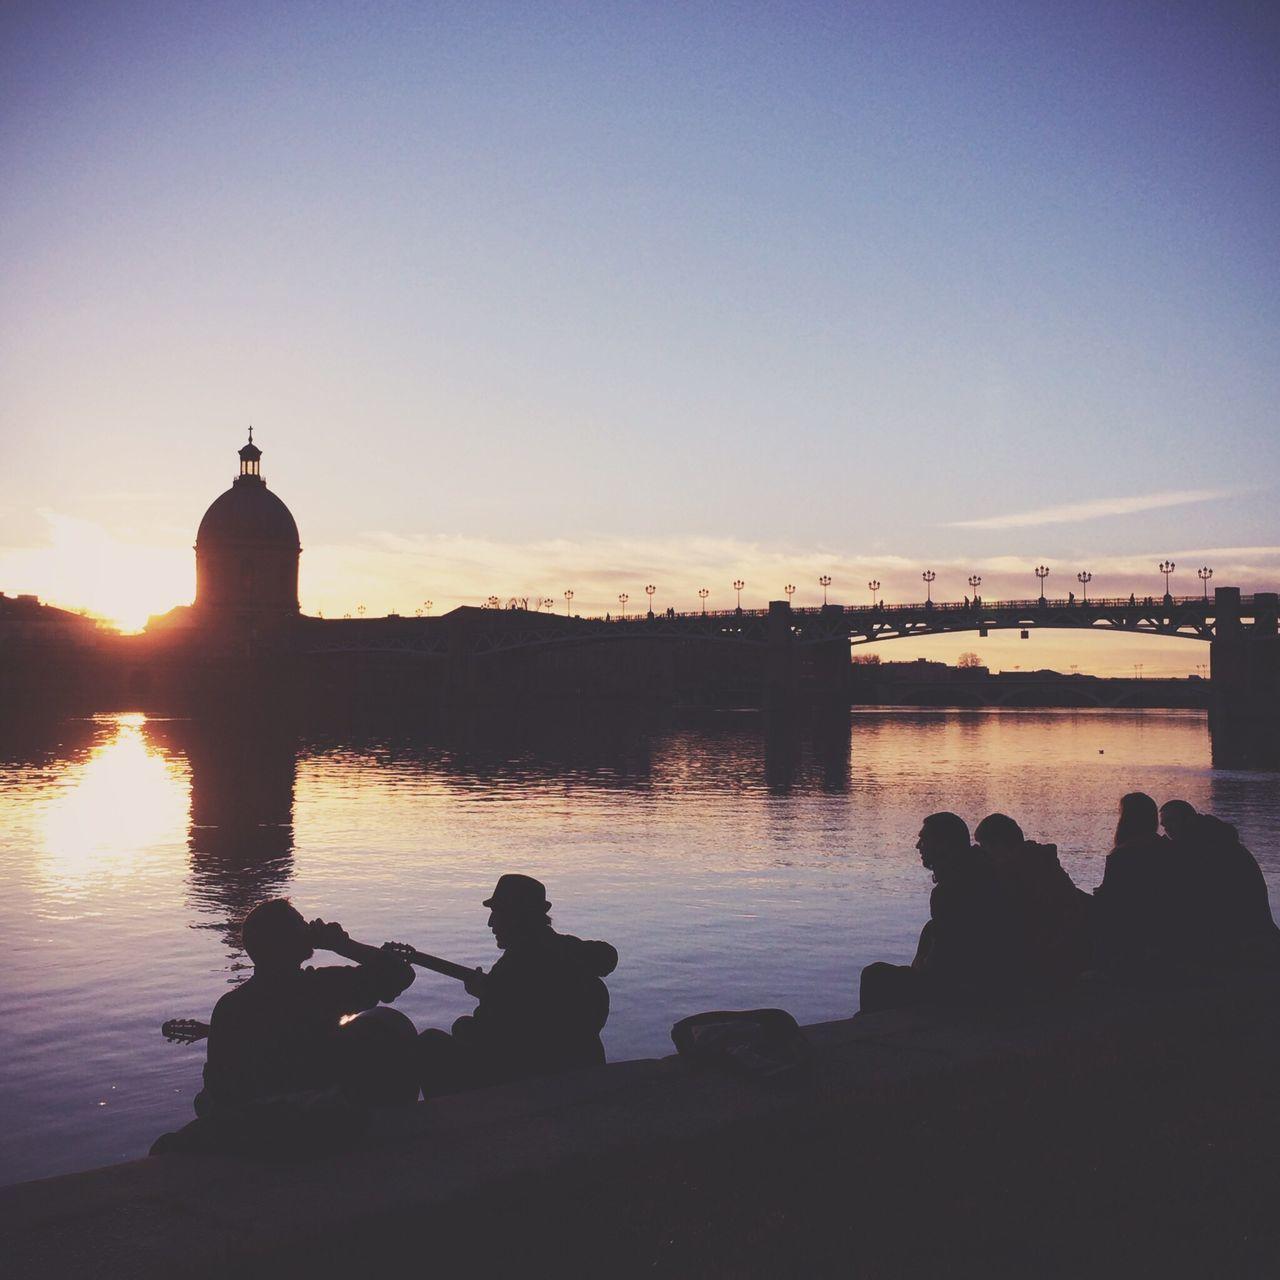 Late afternoon, Toulouse, France Sunset Silhouettes The Illuminator - 2014 EyeEm Awards The Explorer - 2014 EyeEm Awards